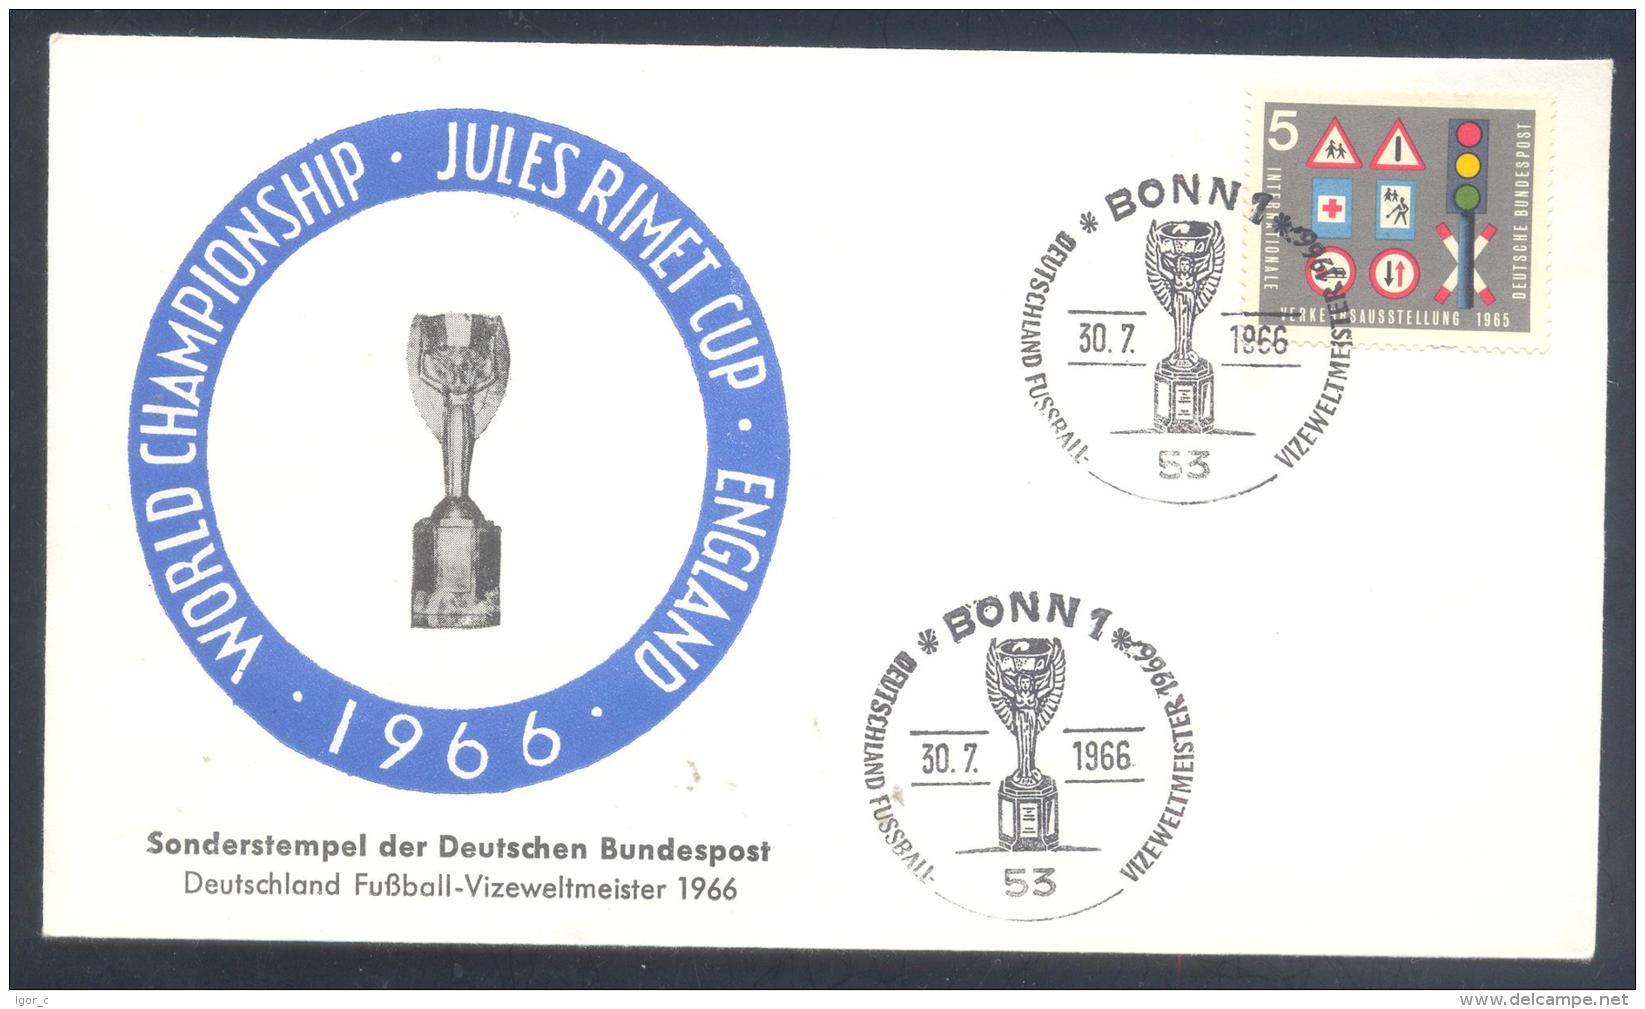 Germany 1966 Cover; Football Soccer Fussball Calcio; FIFA World Cup WM Weltmeisterschaft Mundial Jules Rimet Cup - Coupe Du Monde